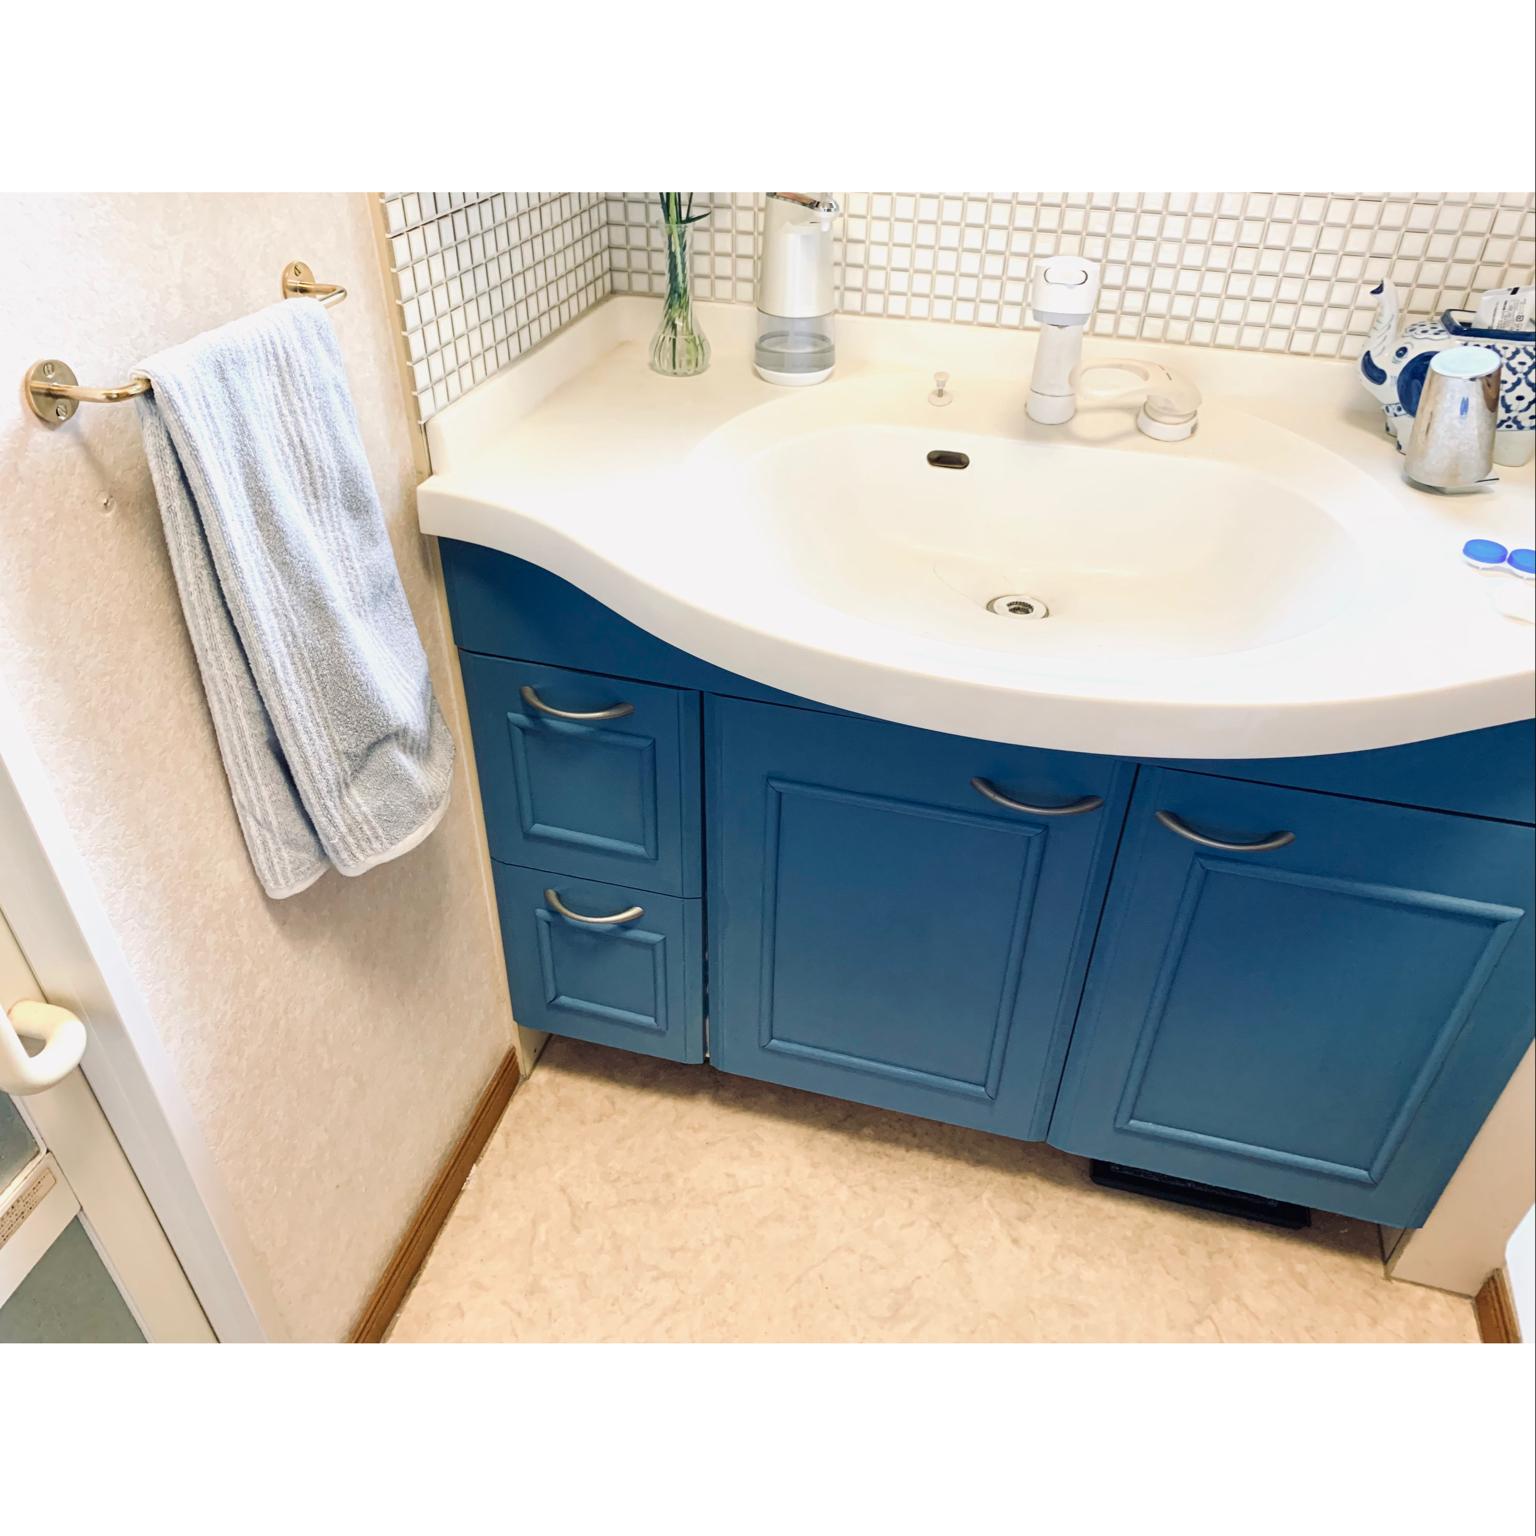 DIY/北欧/洗面所DIY/パリジャンブルー/バス/トイレのインテリア実例 - 2021-04-22 21:29:22